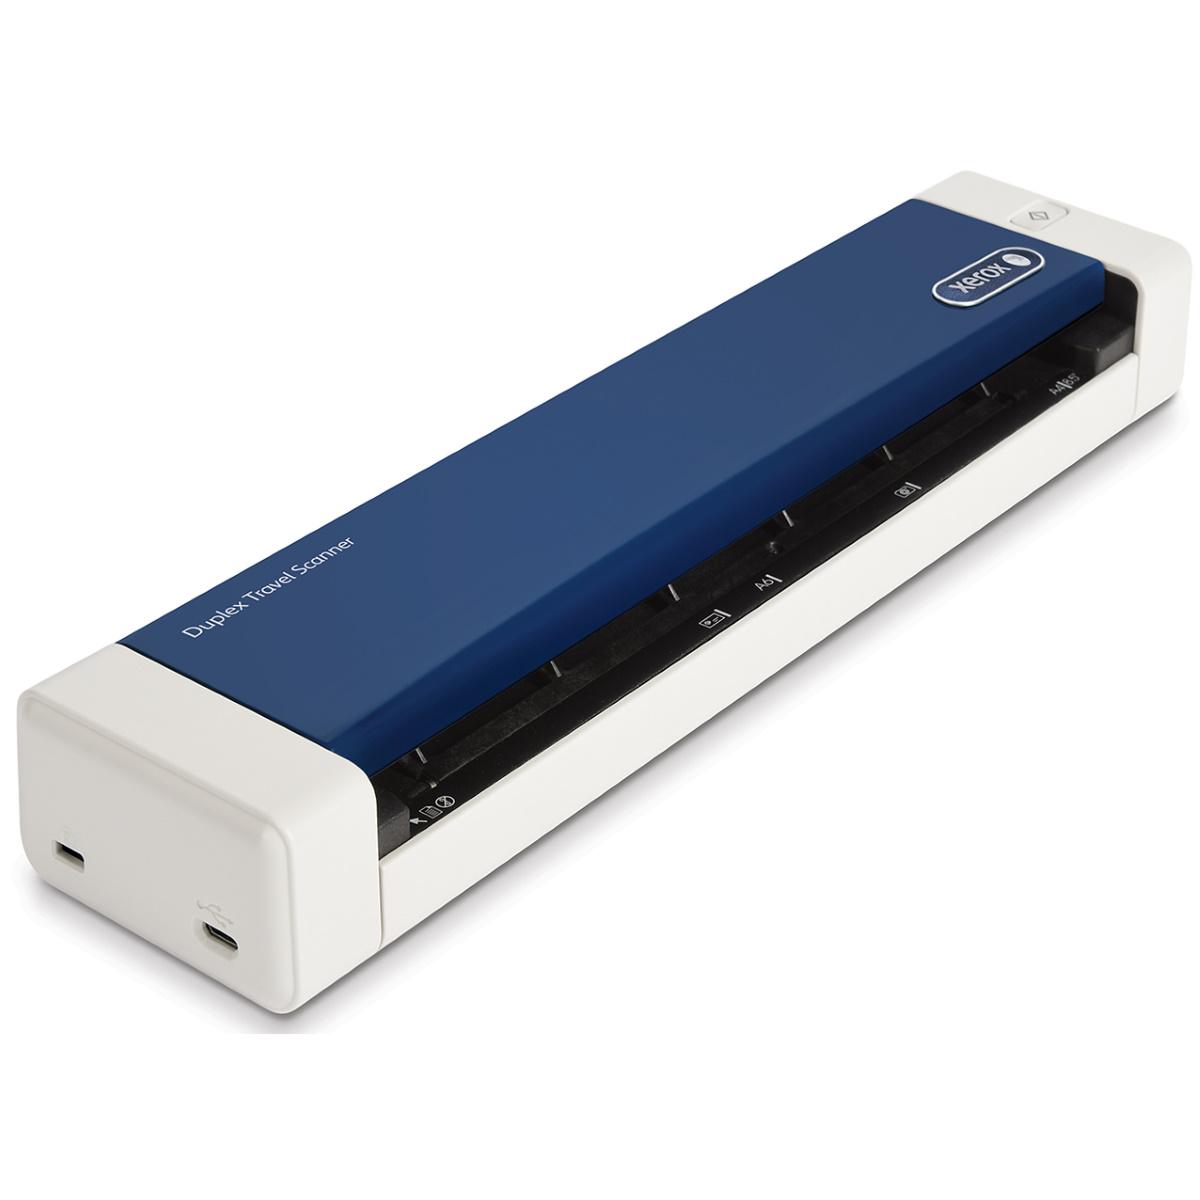 Сканер Xerox Duplex Portable (100N03261)